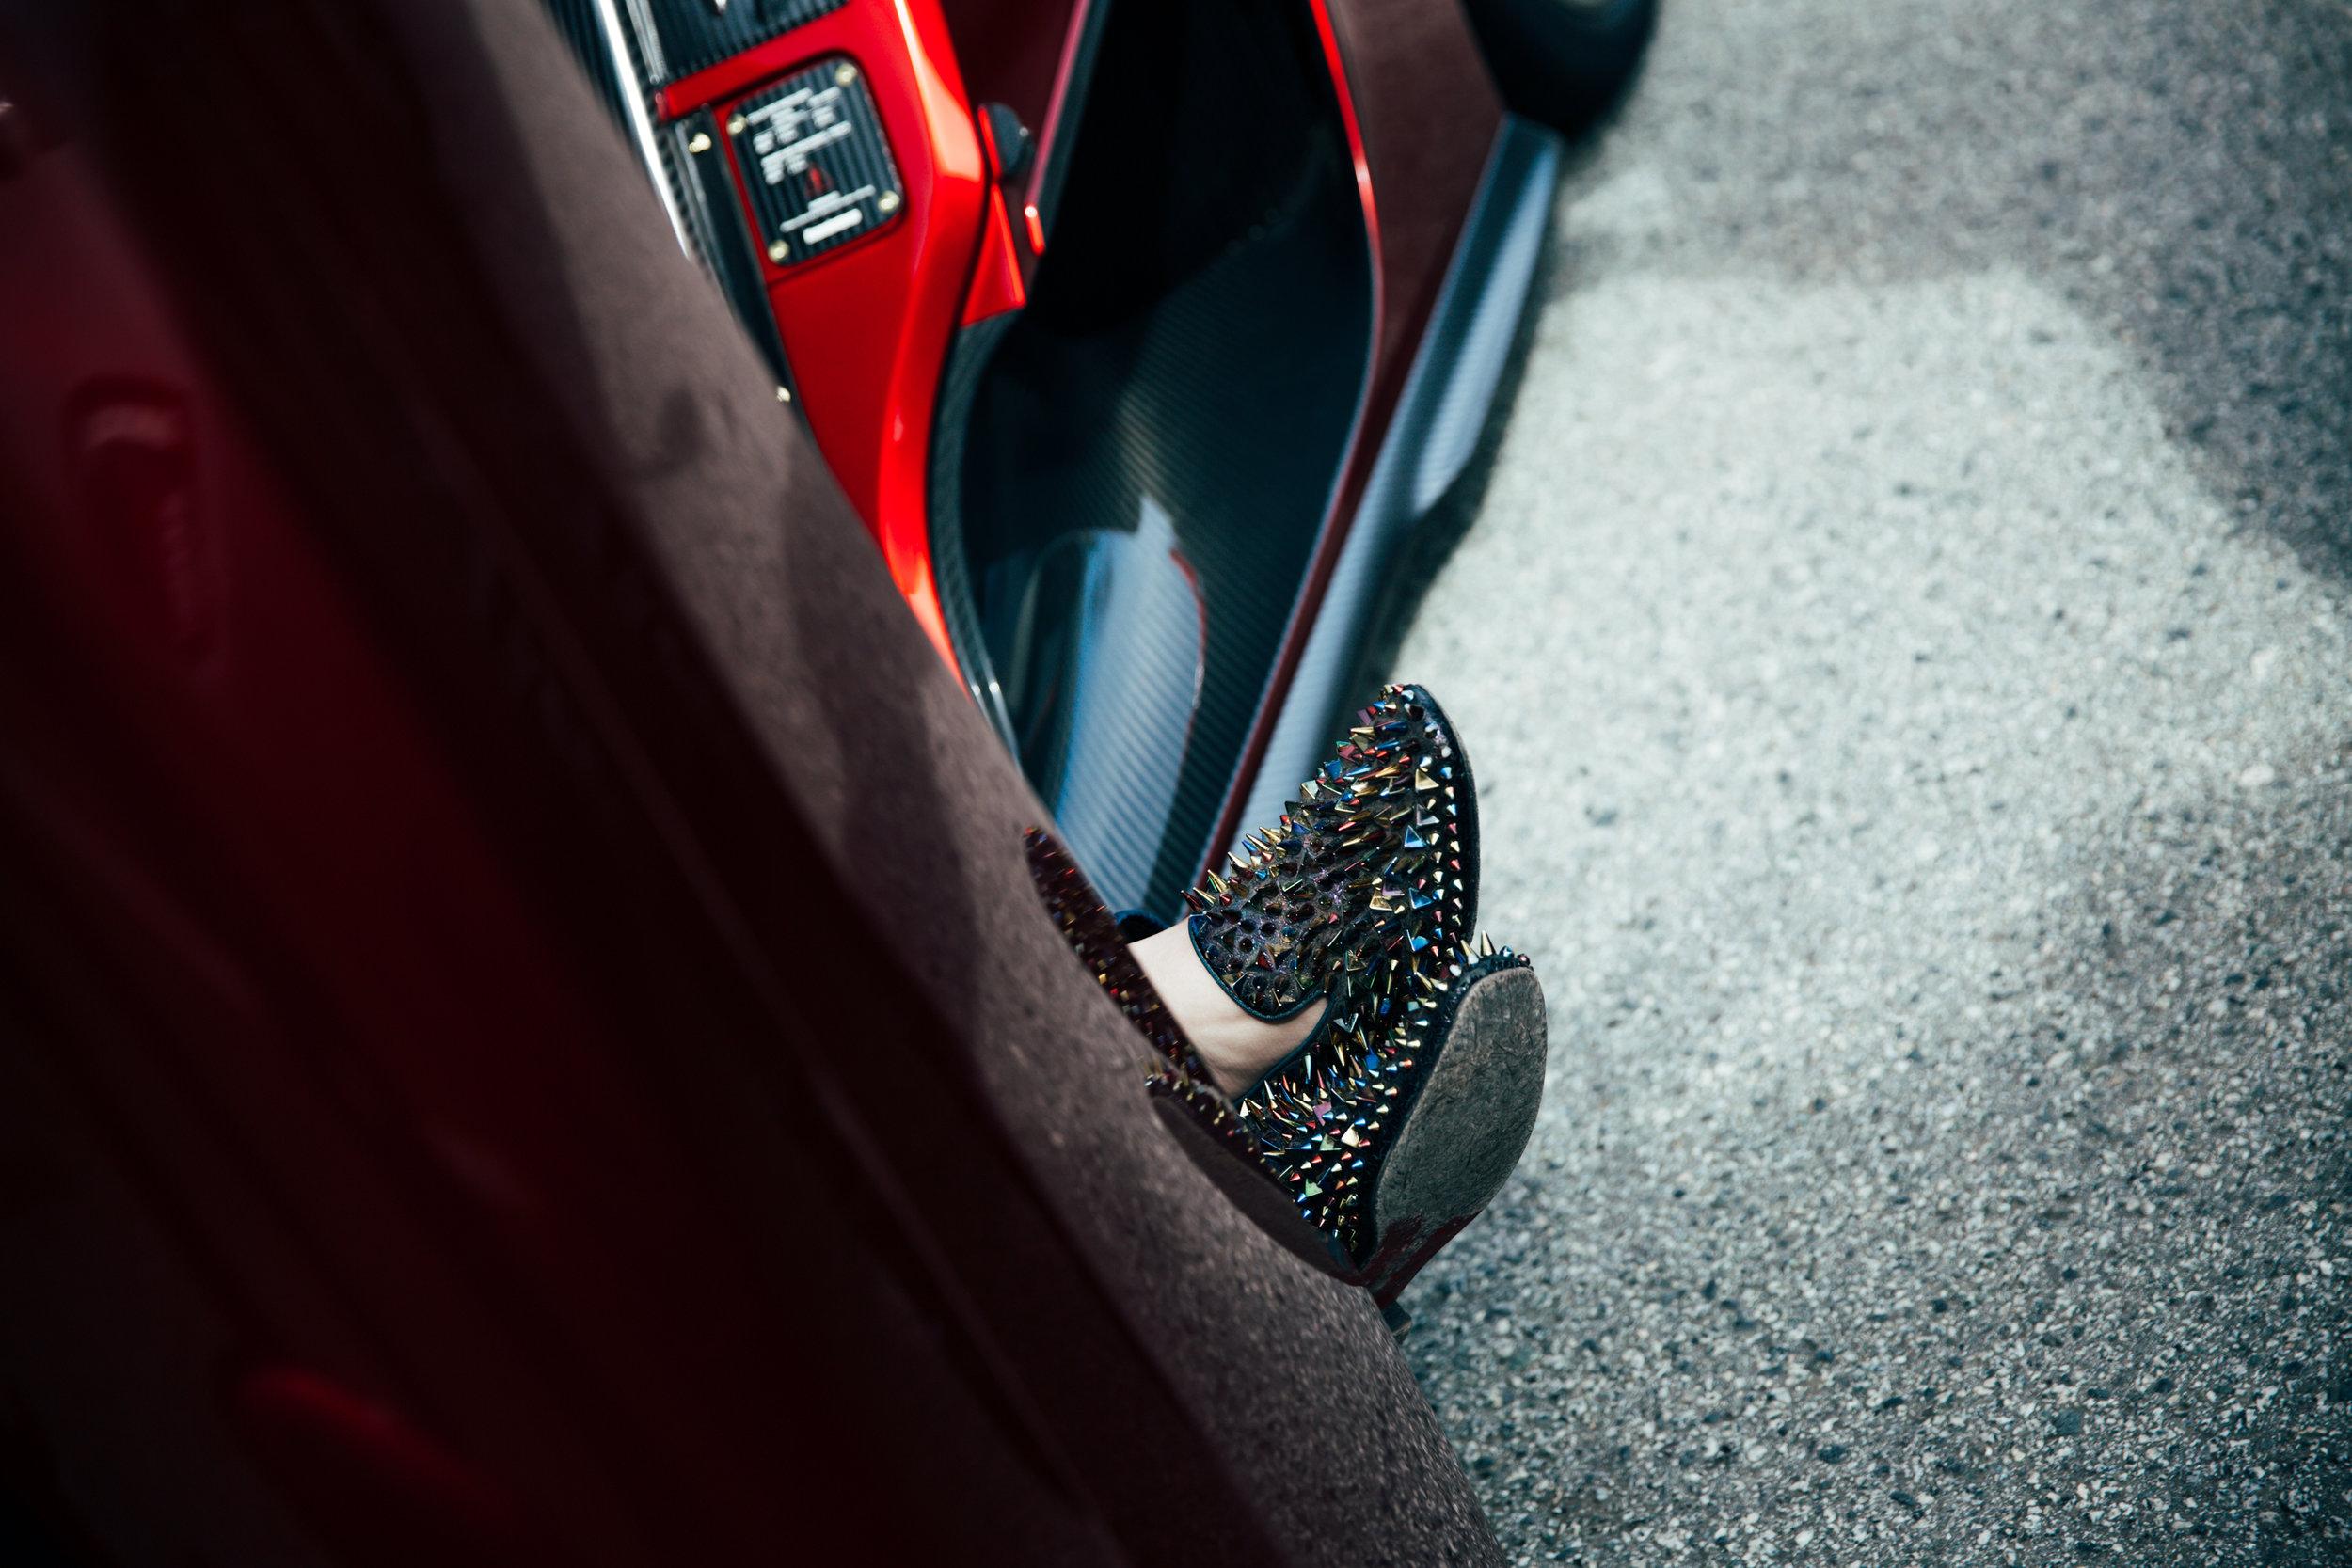 Stay_Driven_Monterey_Car_Week_Koenigsegg-40.jpg